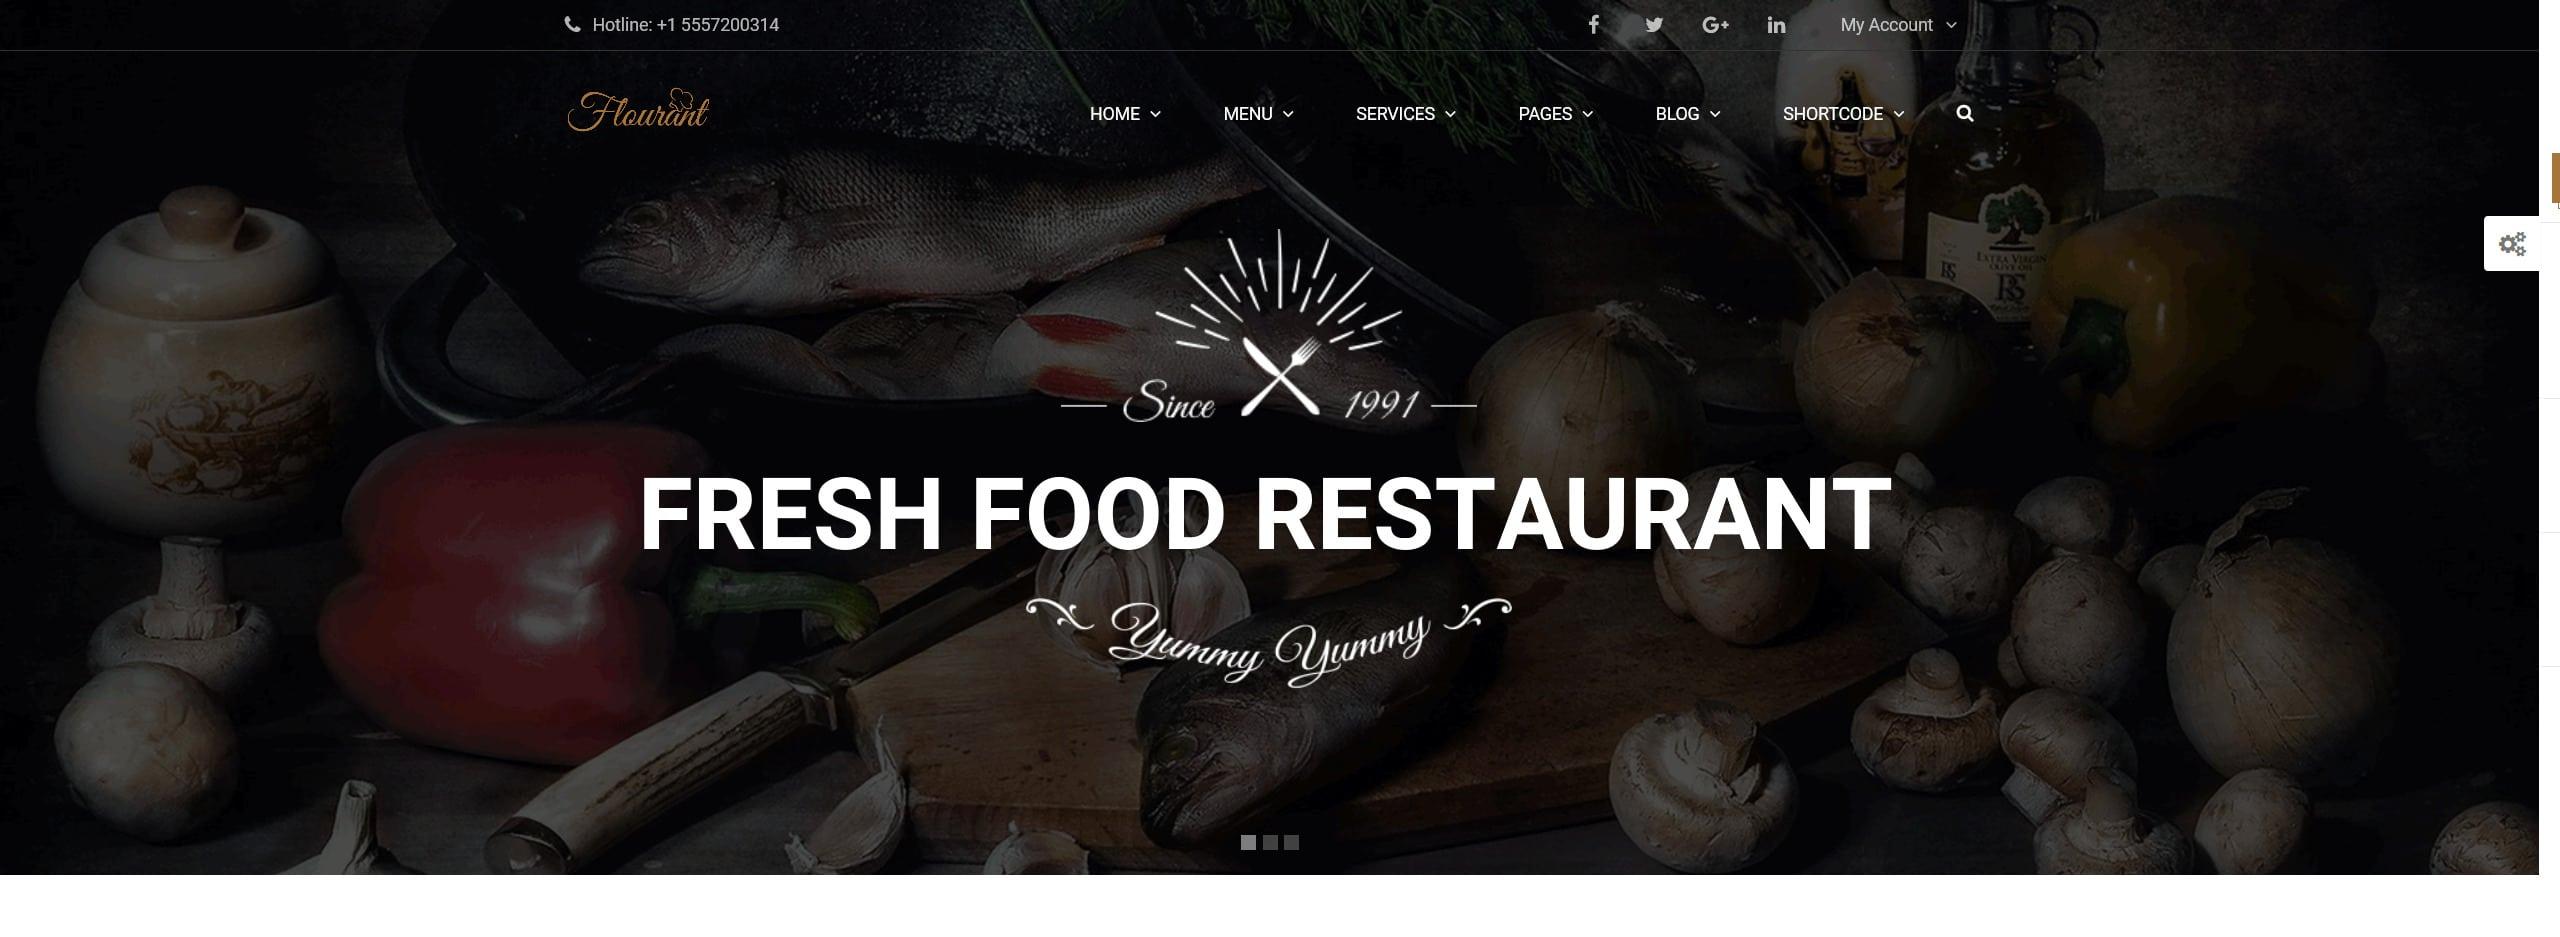 restaurant website, wordpress website design services